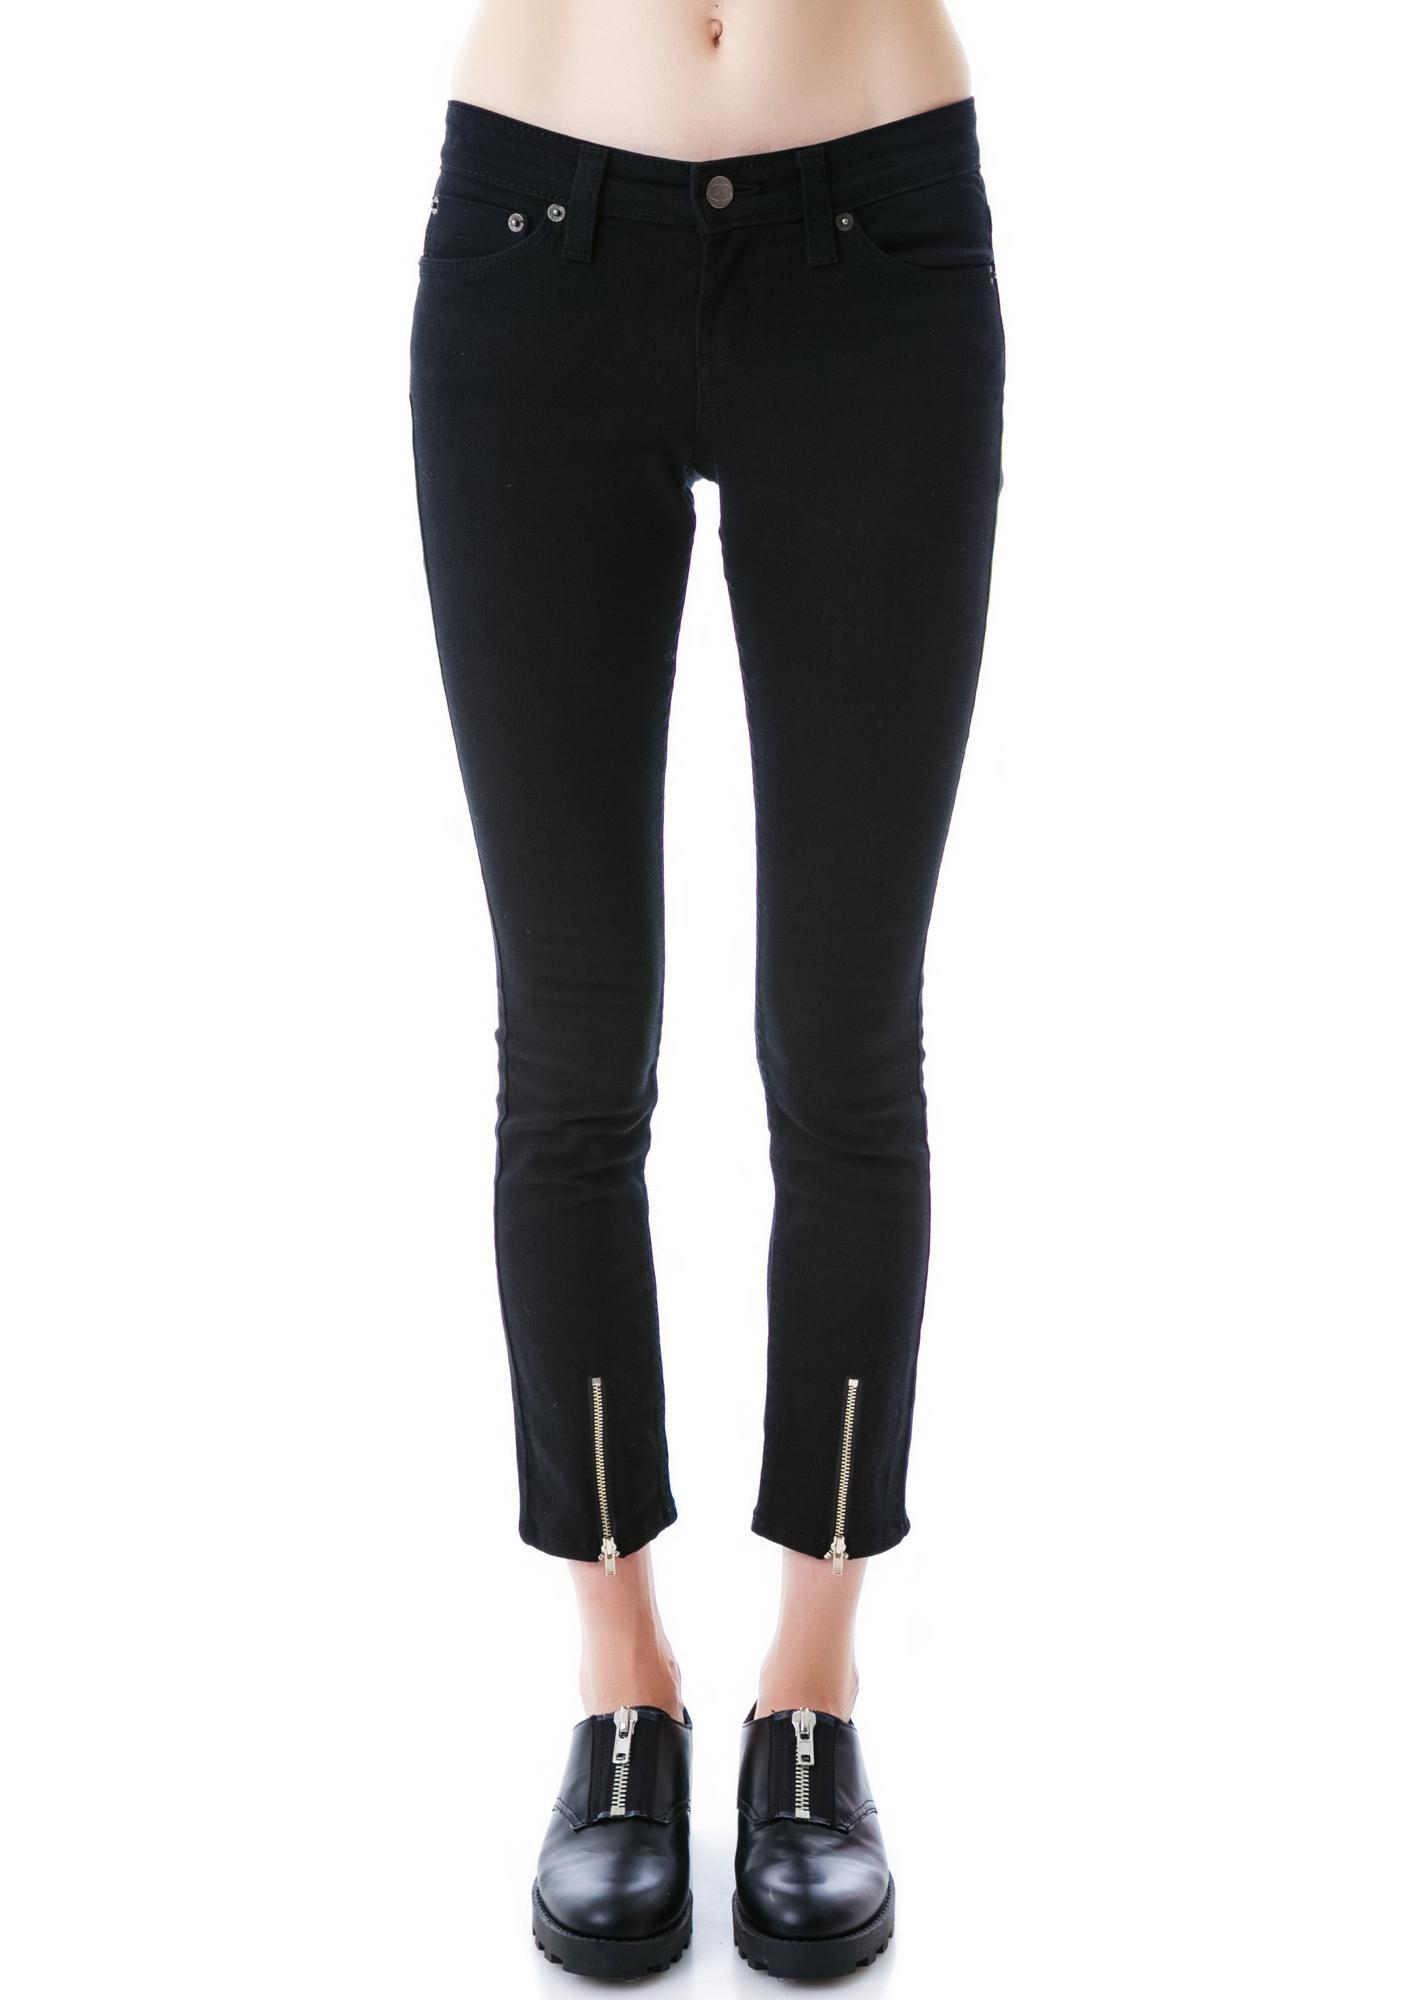 JET by John Eshaya Zip Front Skinny Jeans